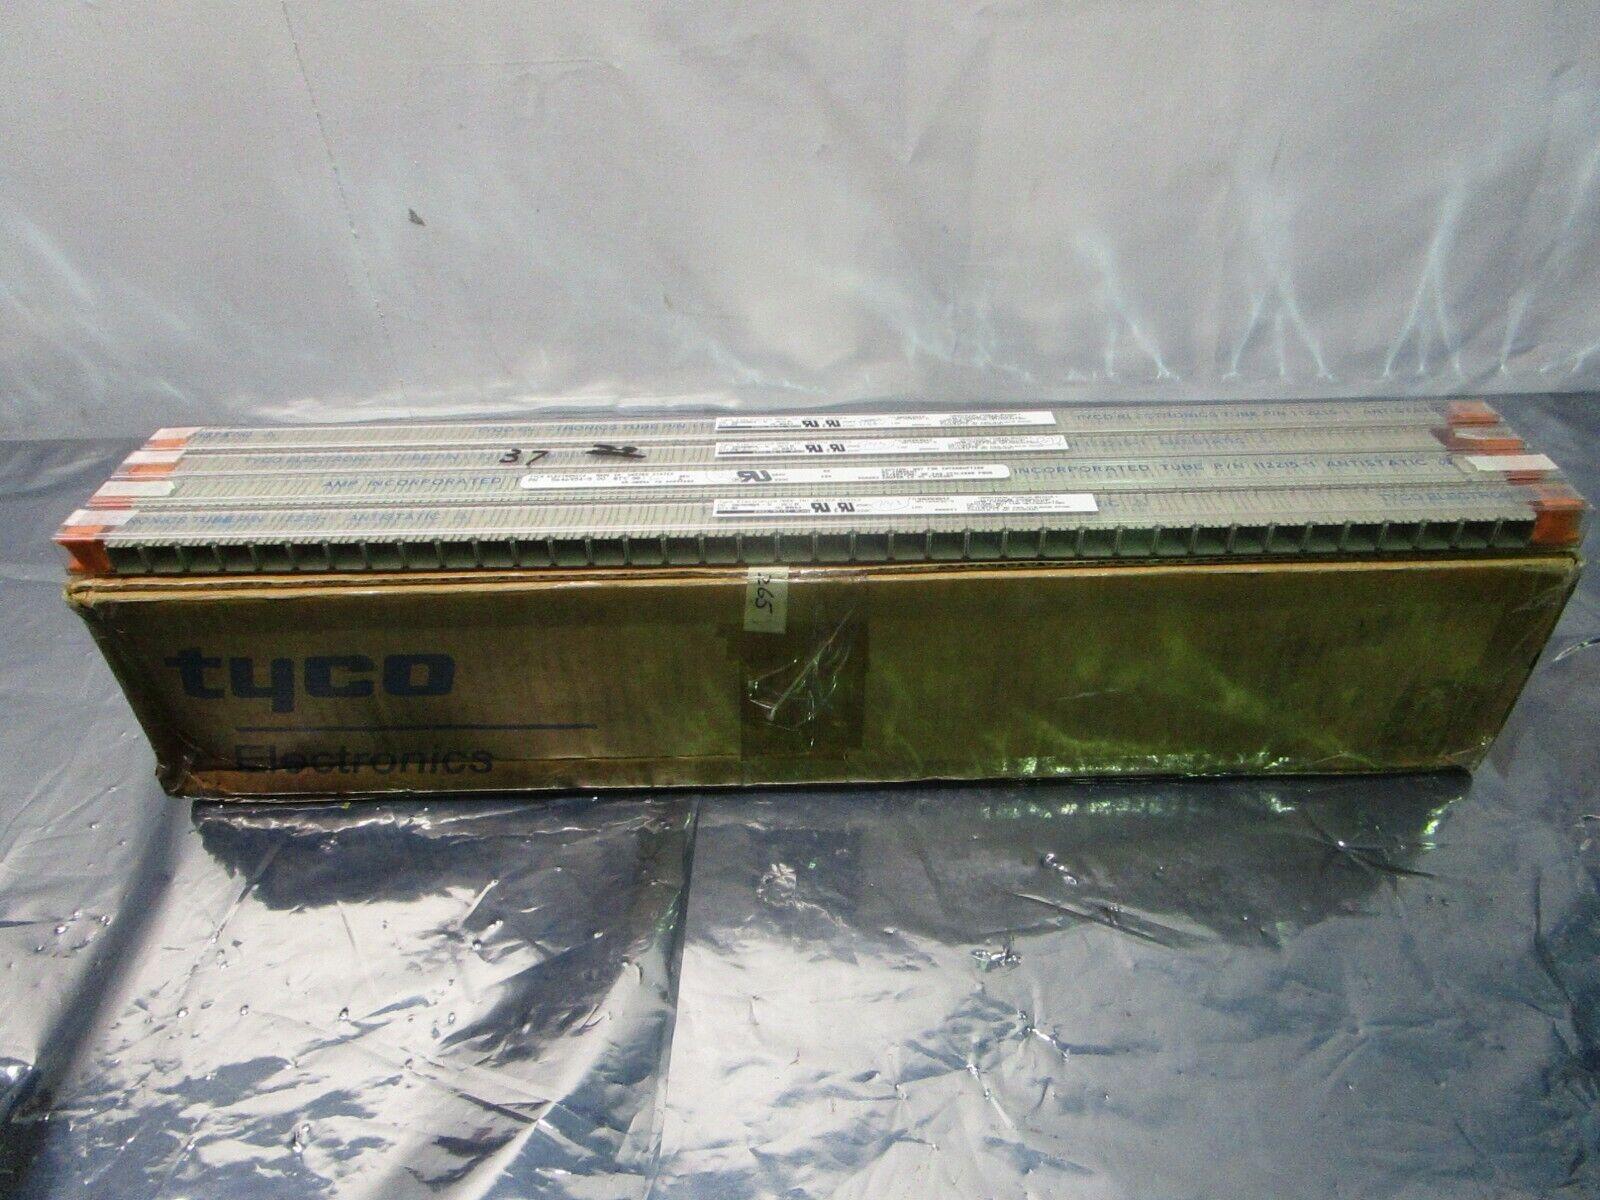 1 Lot of 151 TE Connectivity 5646954-5 Conn Power PL 4 POS 2mm Solder, 102513